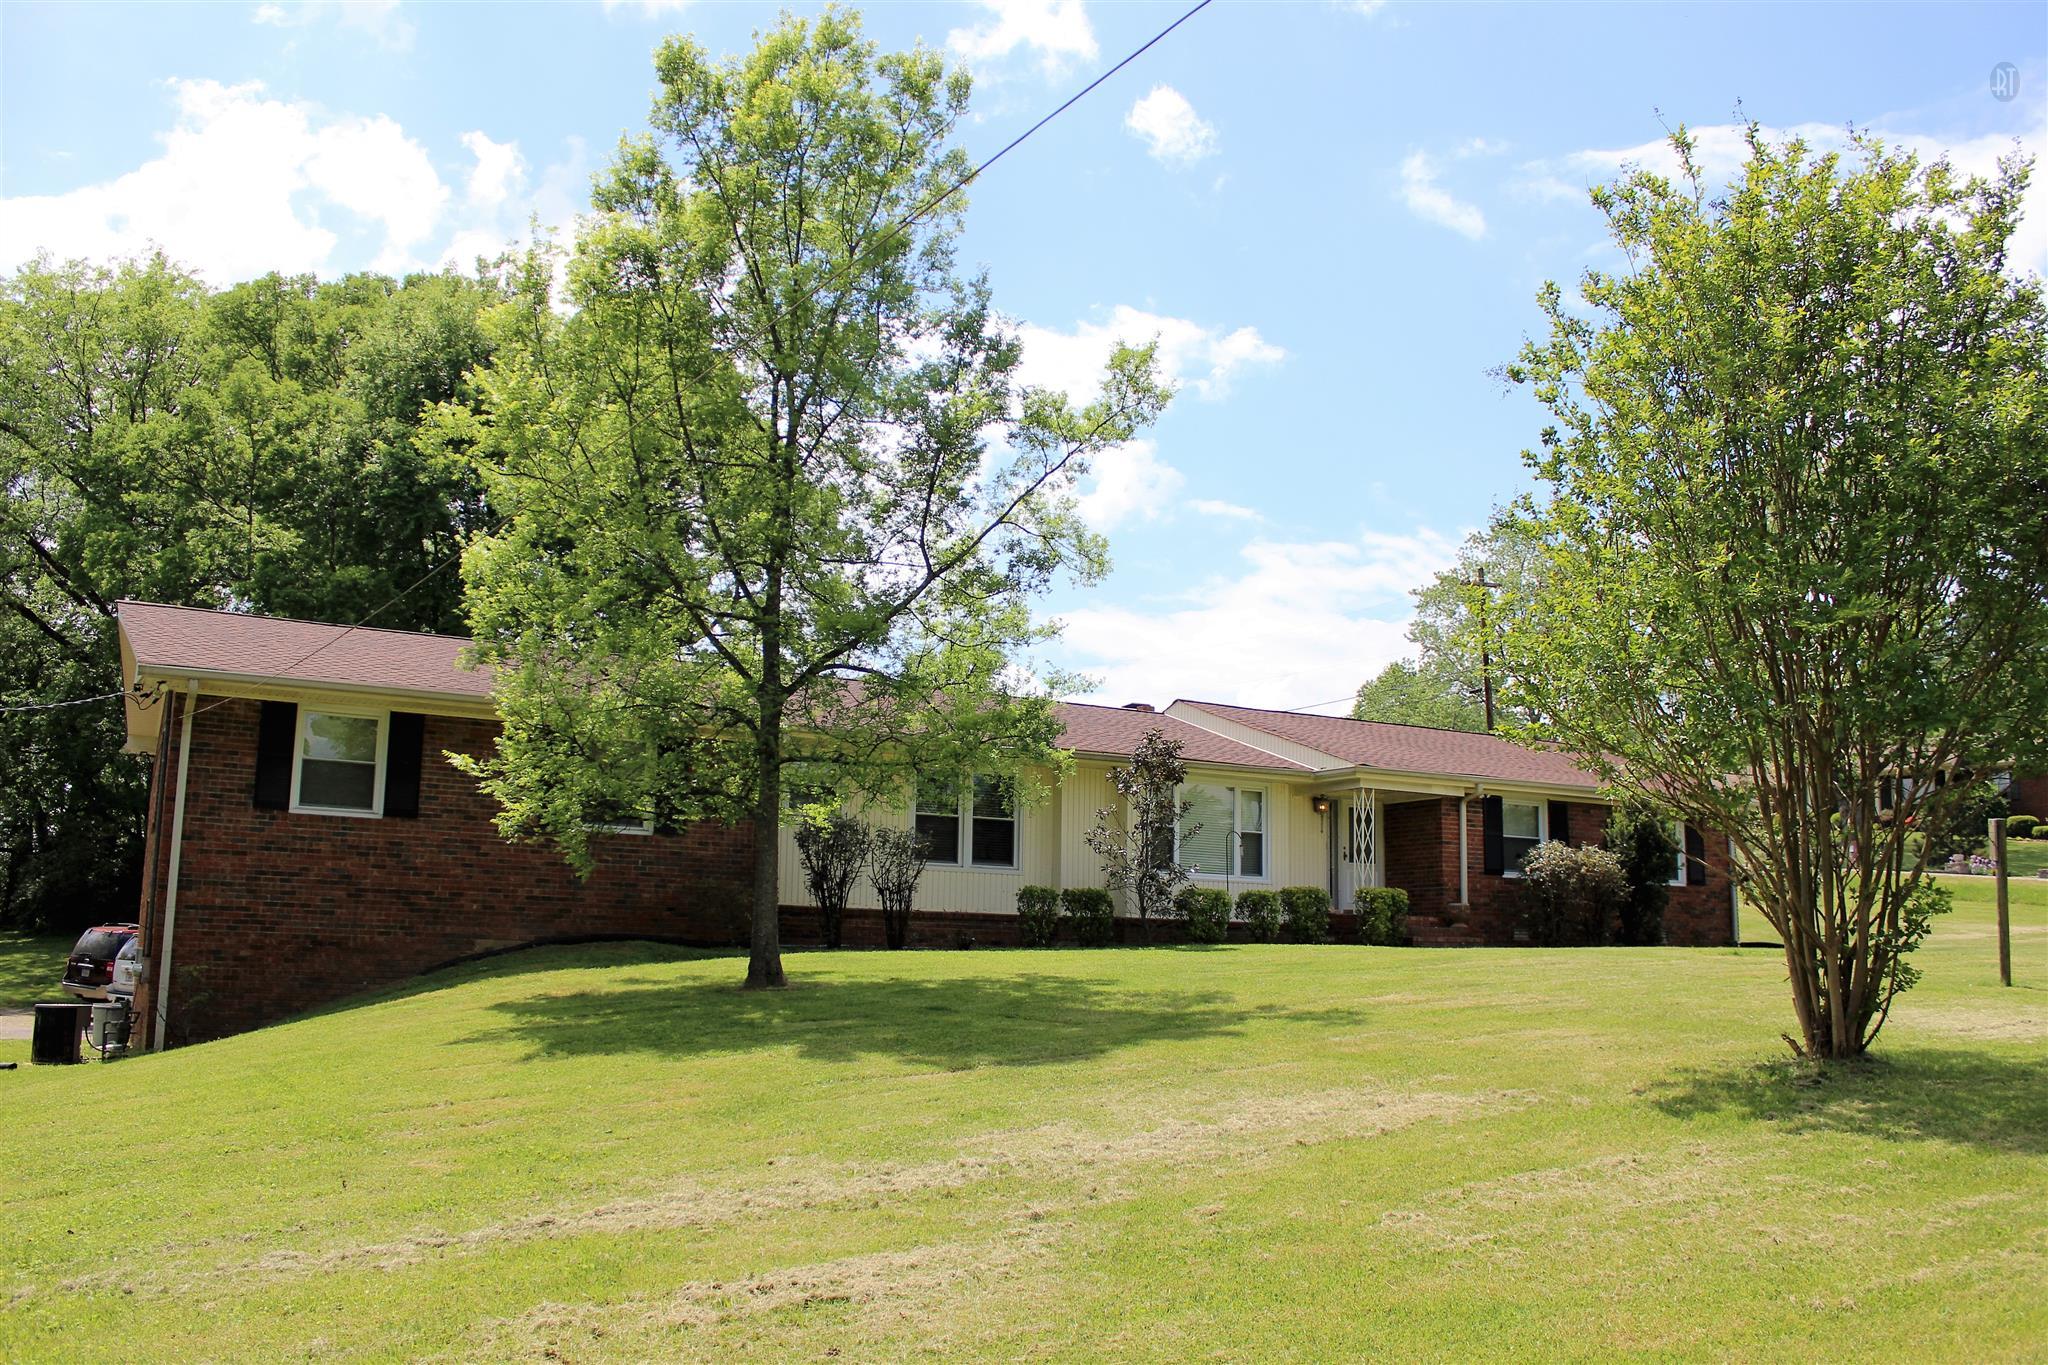 4068 Matilda St, Nashville, TN 37207